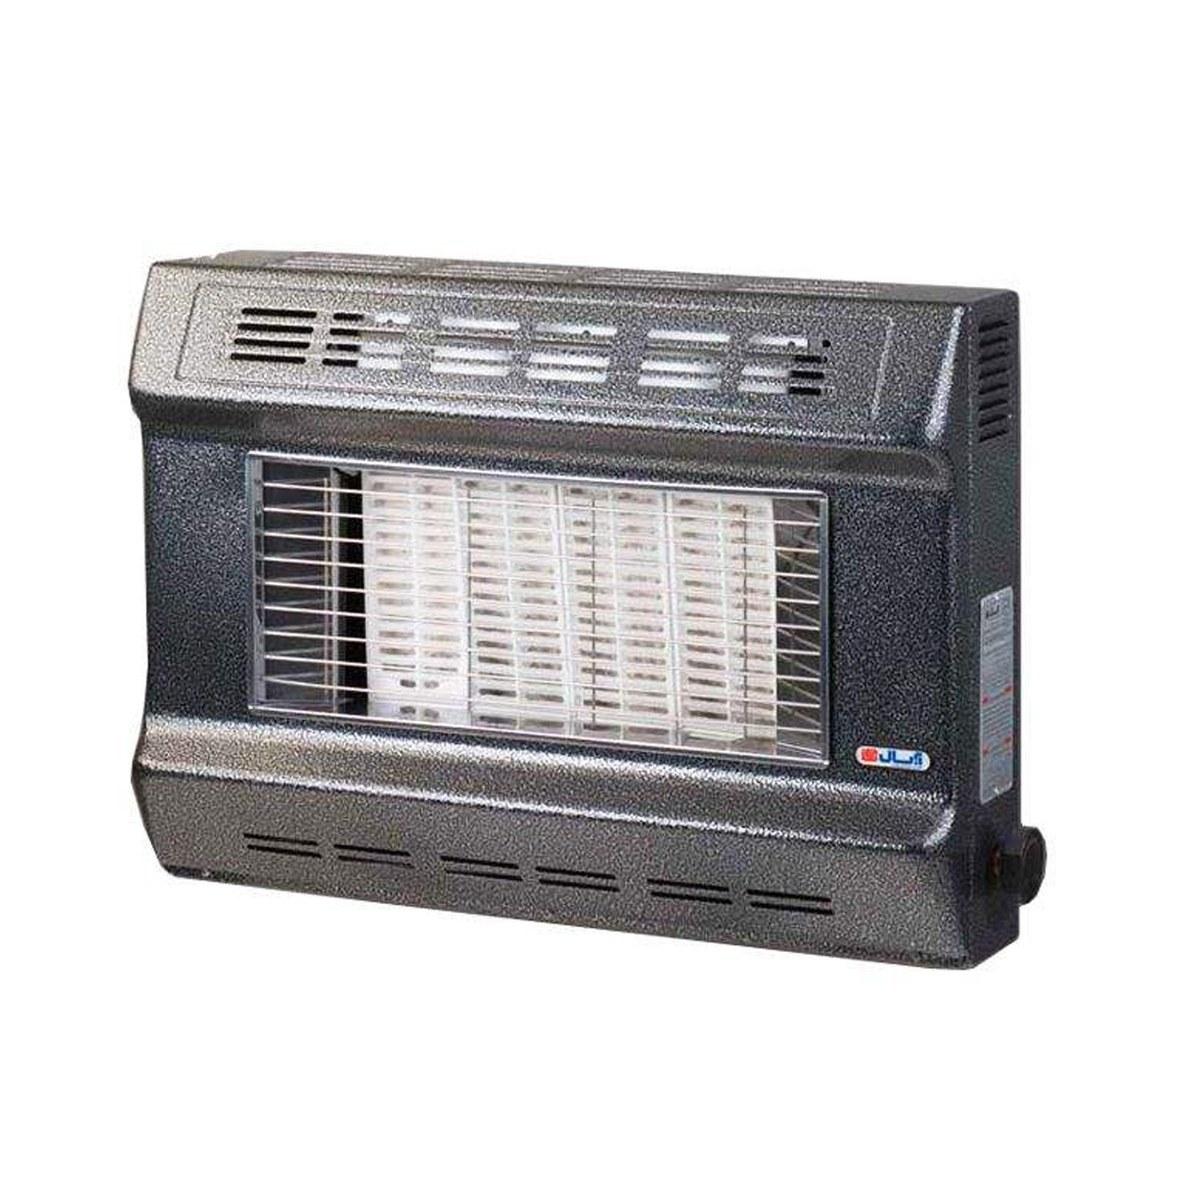 تصویر بخاری گازی آبسال مدل 463 Absal gas heater model 463